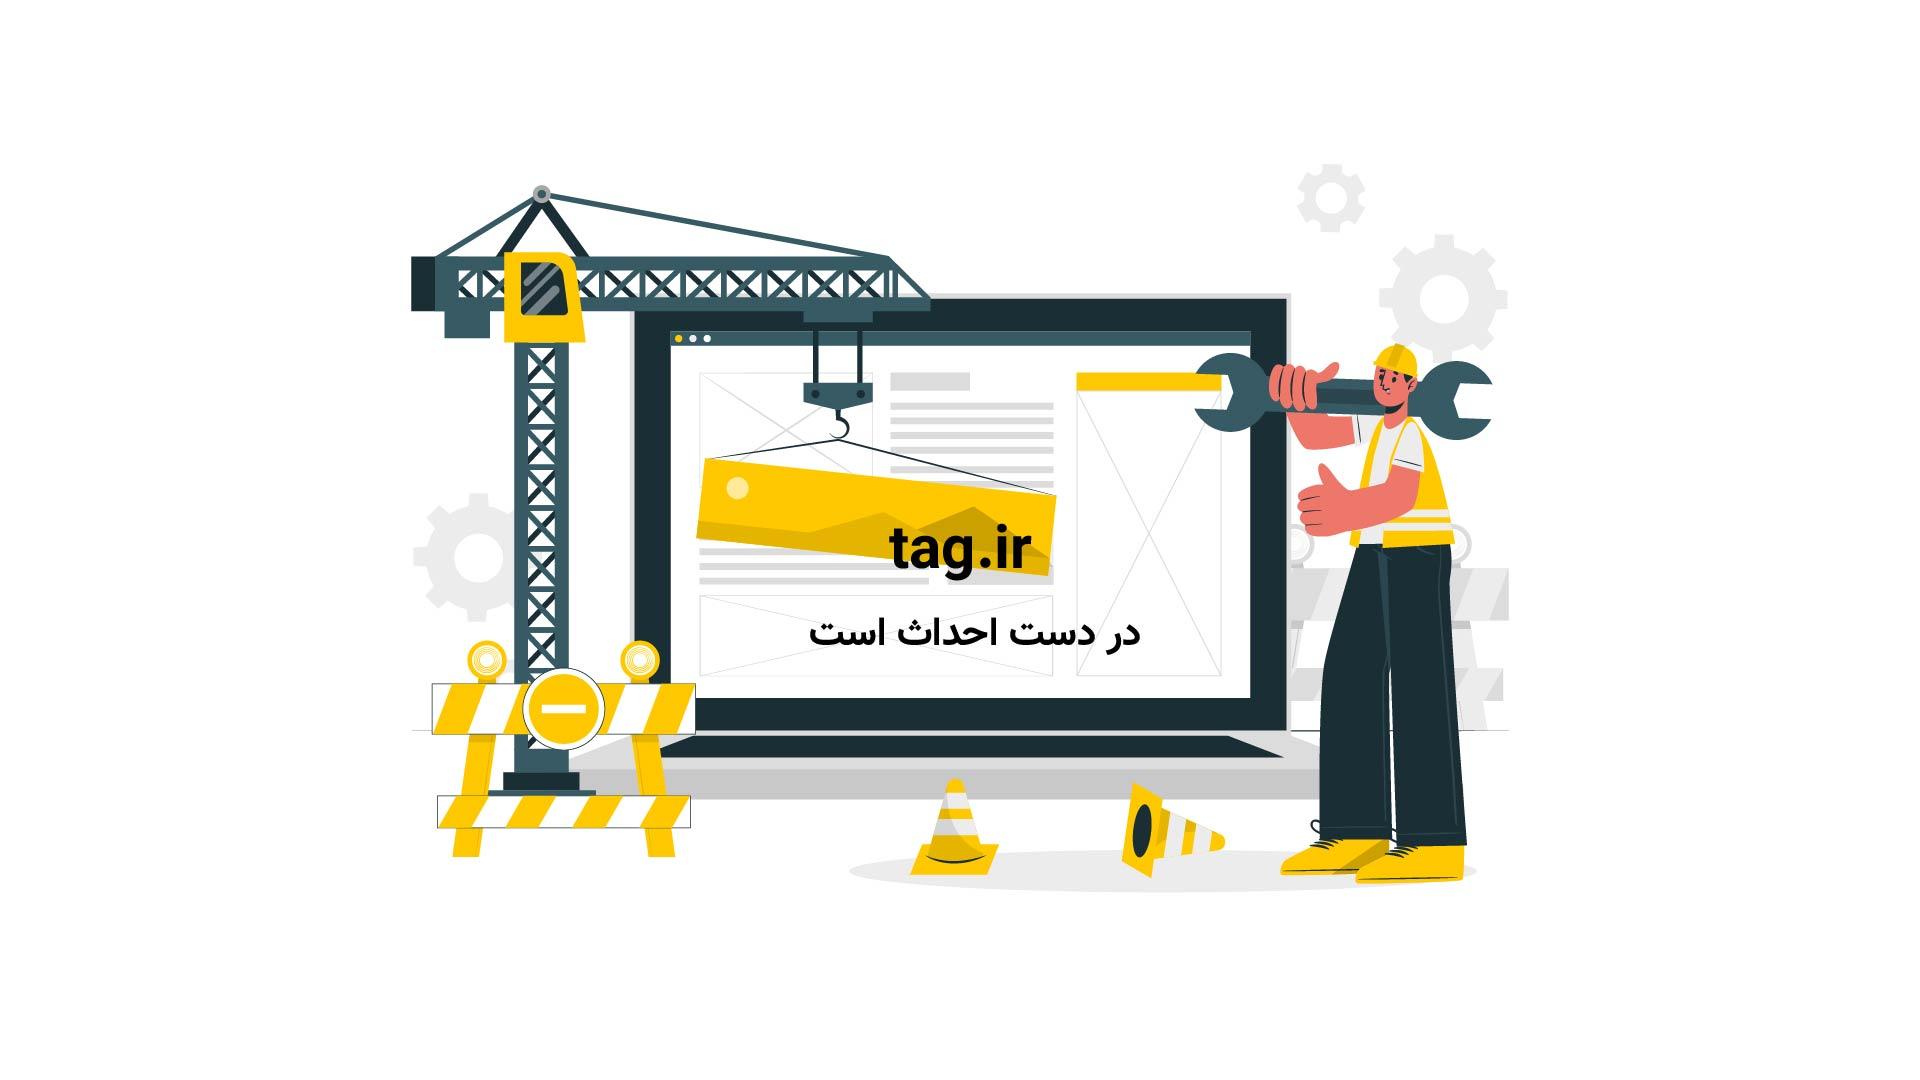 کارتون انگری بردز ؛ این خوک شعبده باز | فیلم